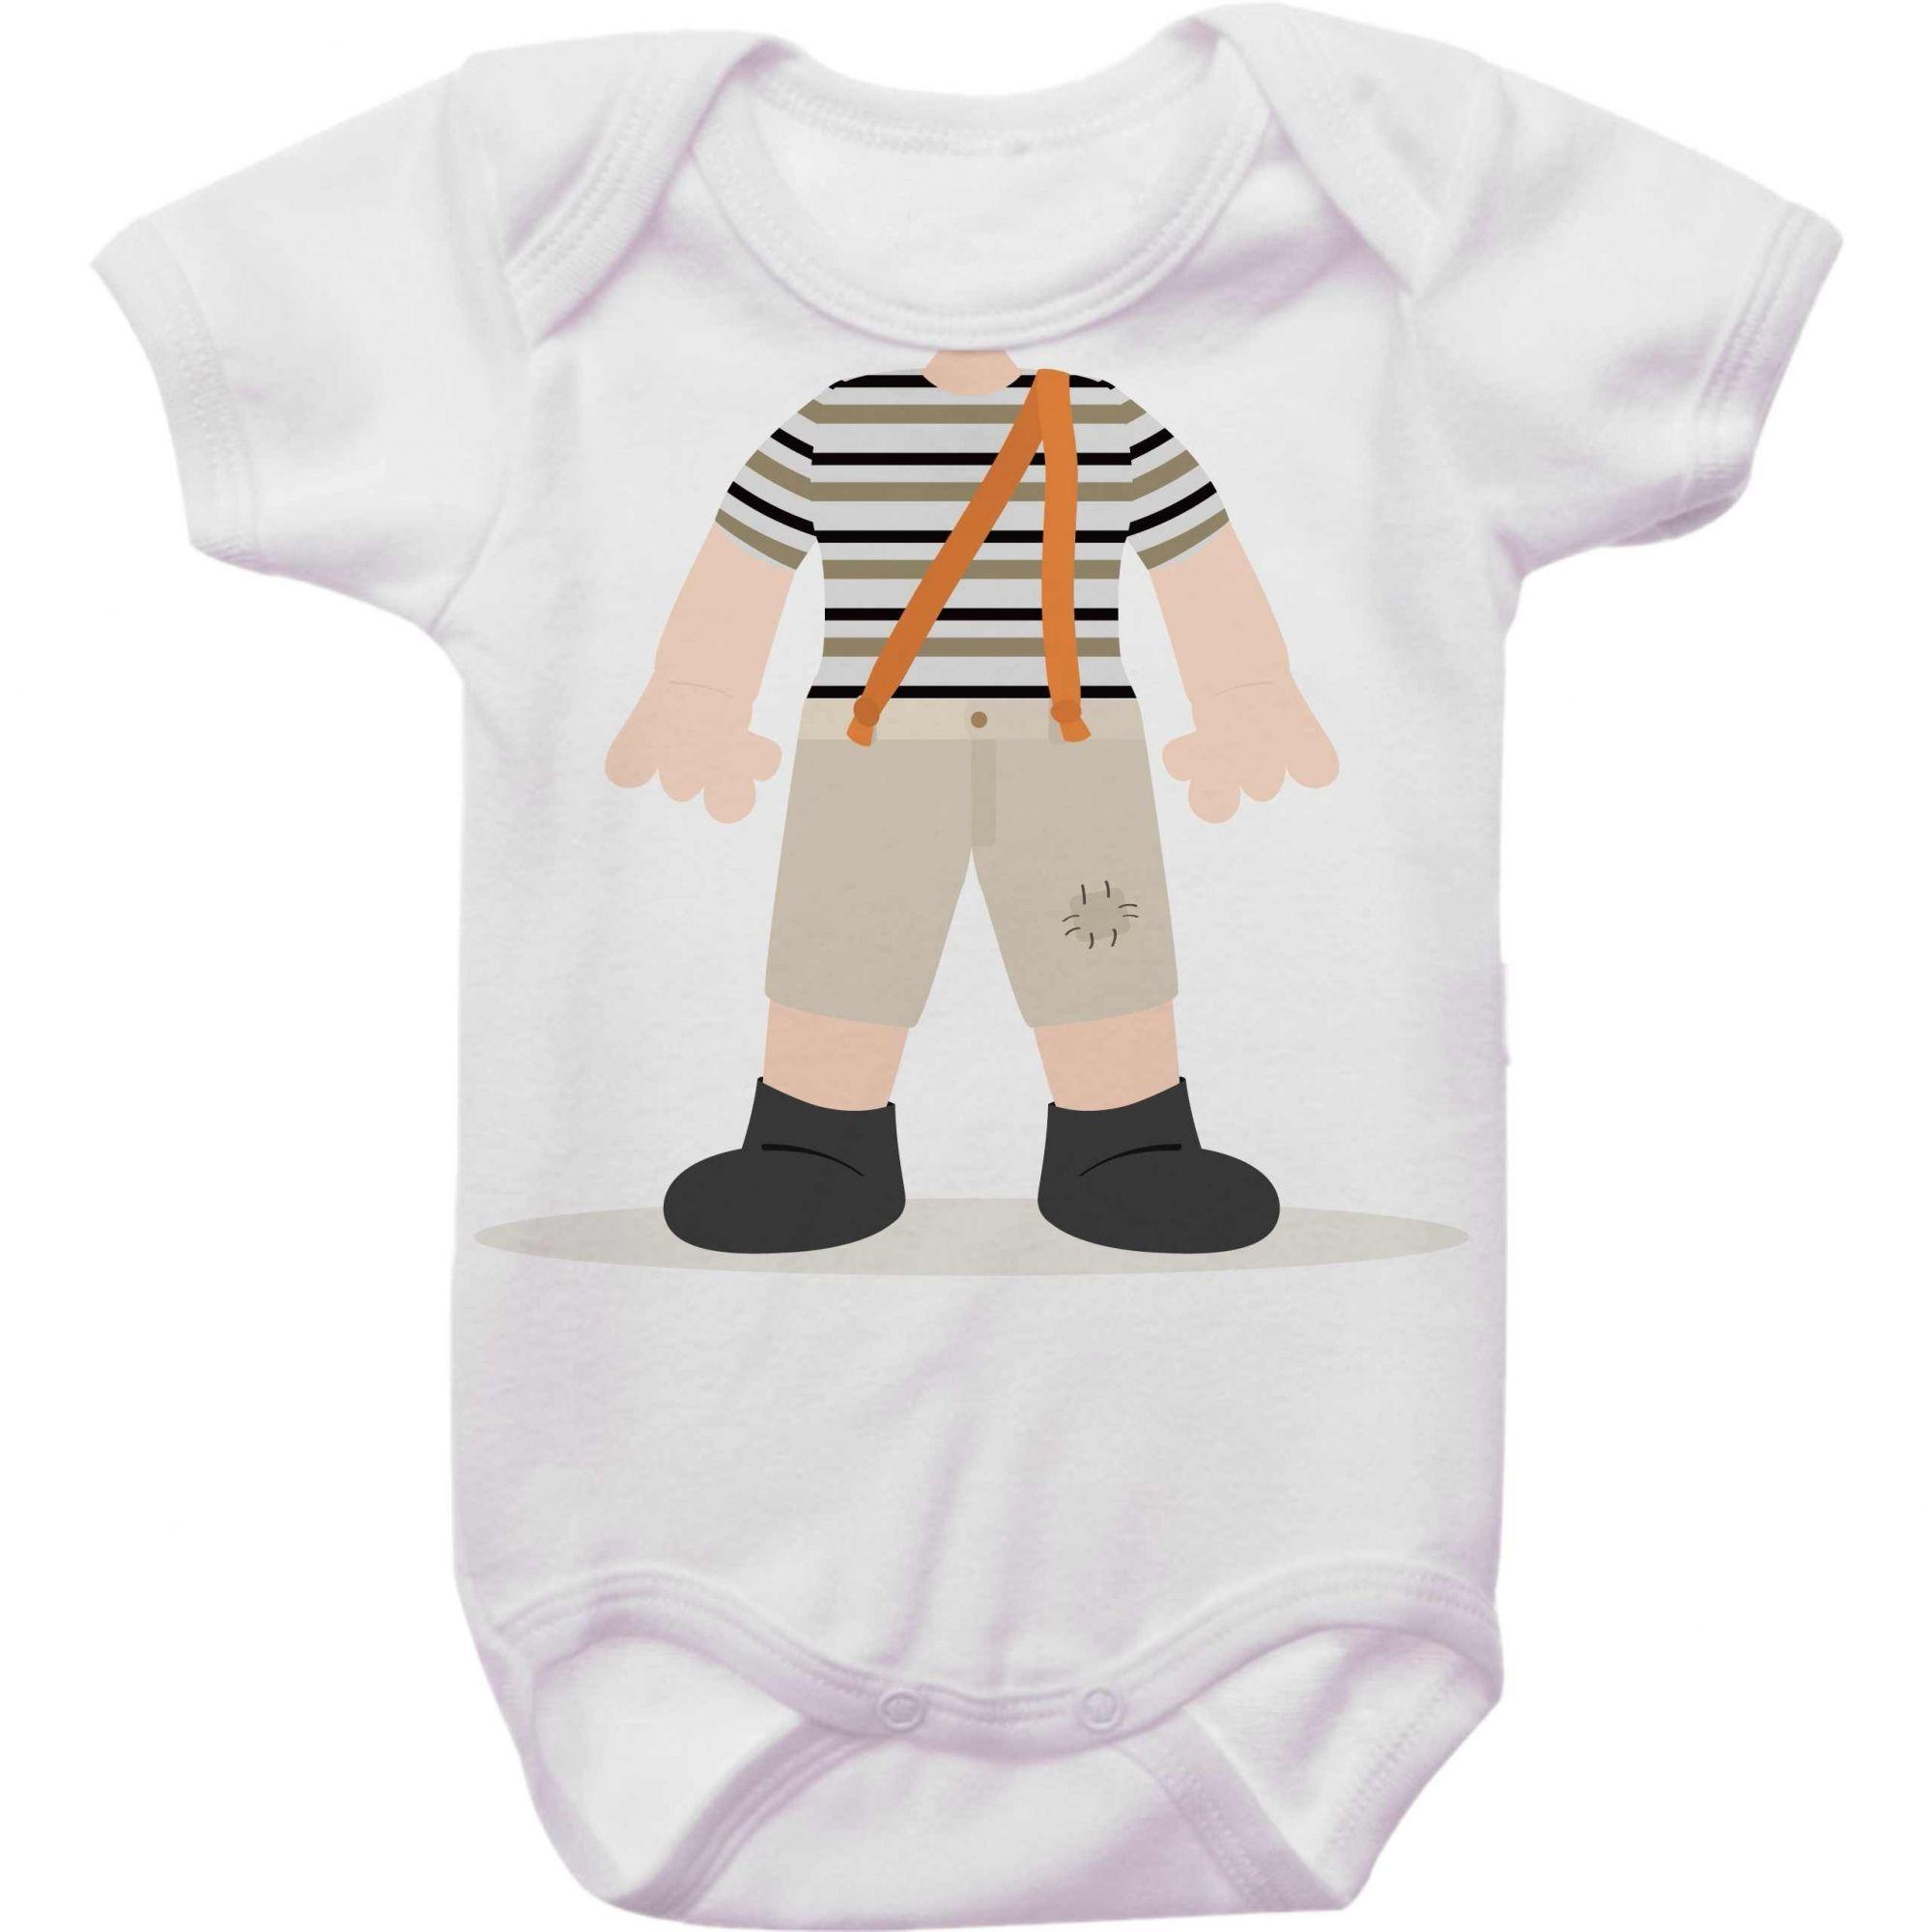 Body Bebê Chaves Sem Cabeça